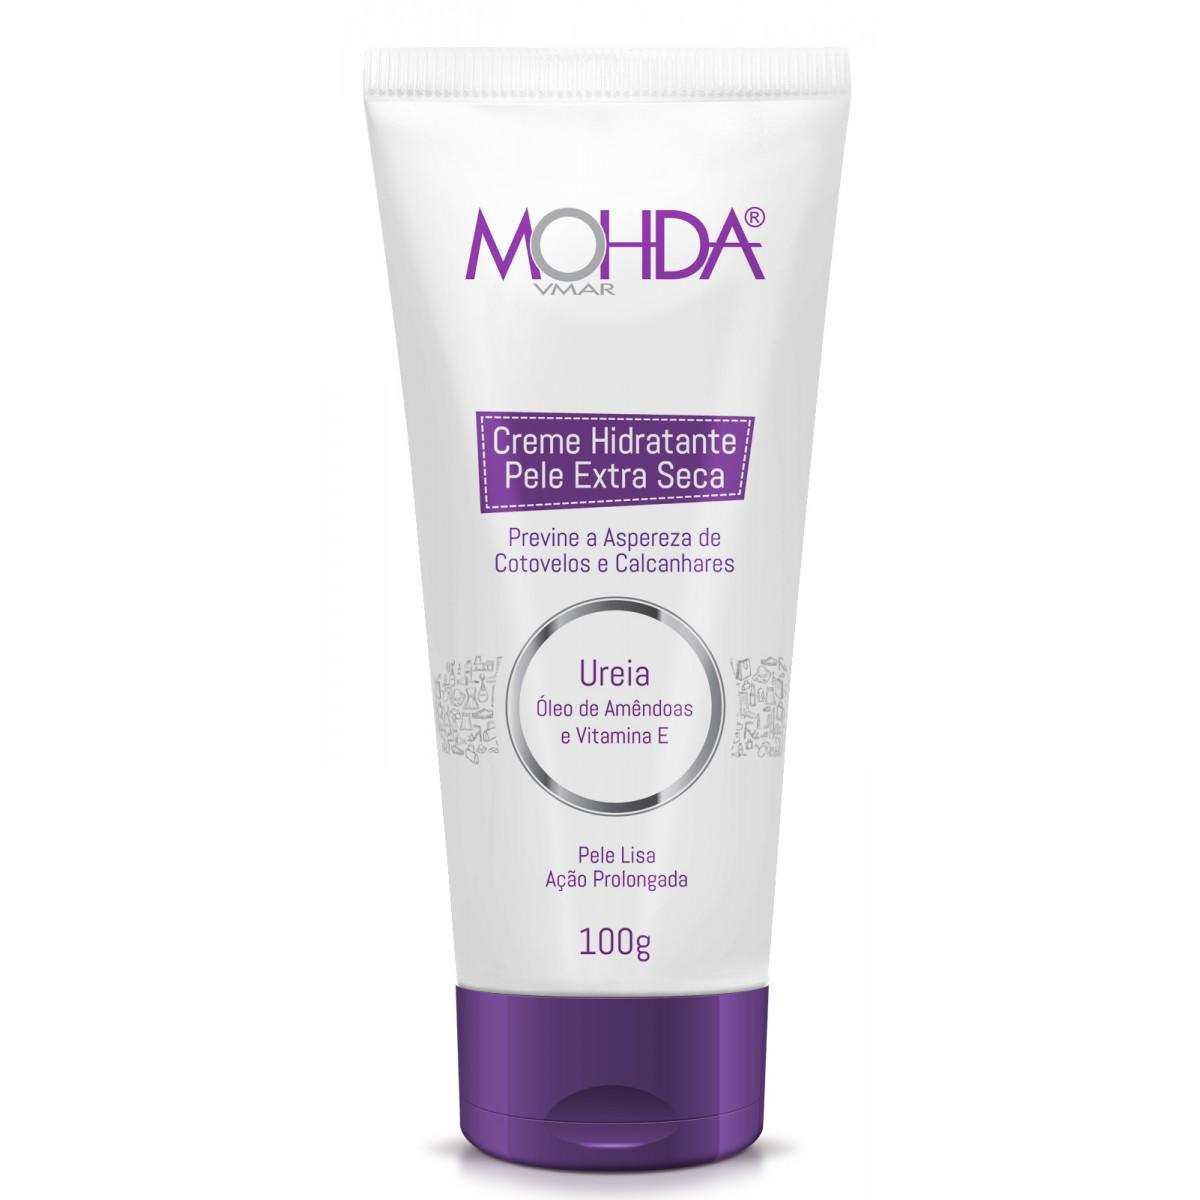 Creme Hidratante Mohda para Pele Extra Seca (100 g)  - E-Mohda